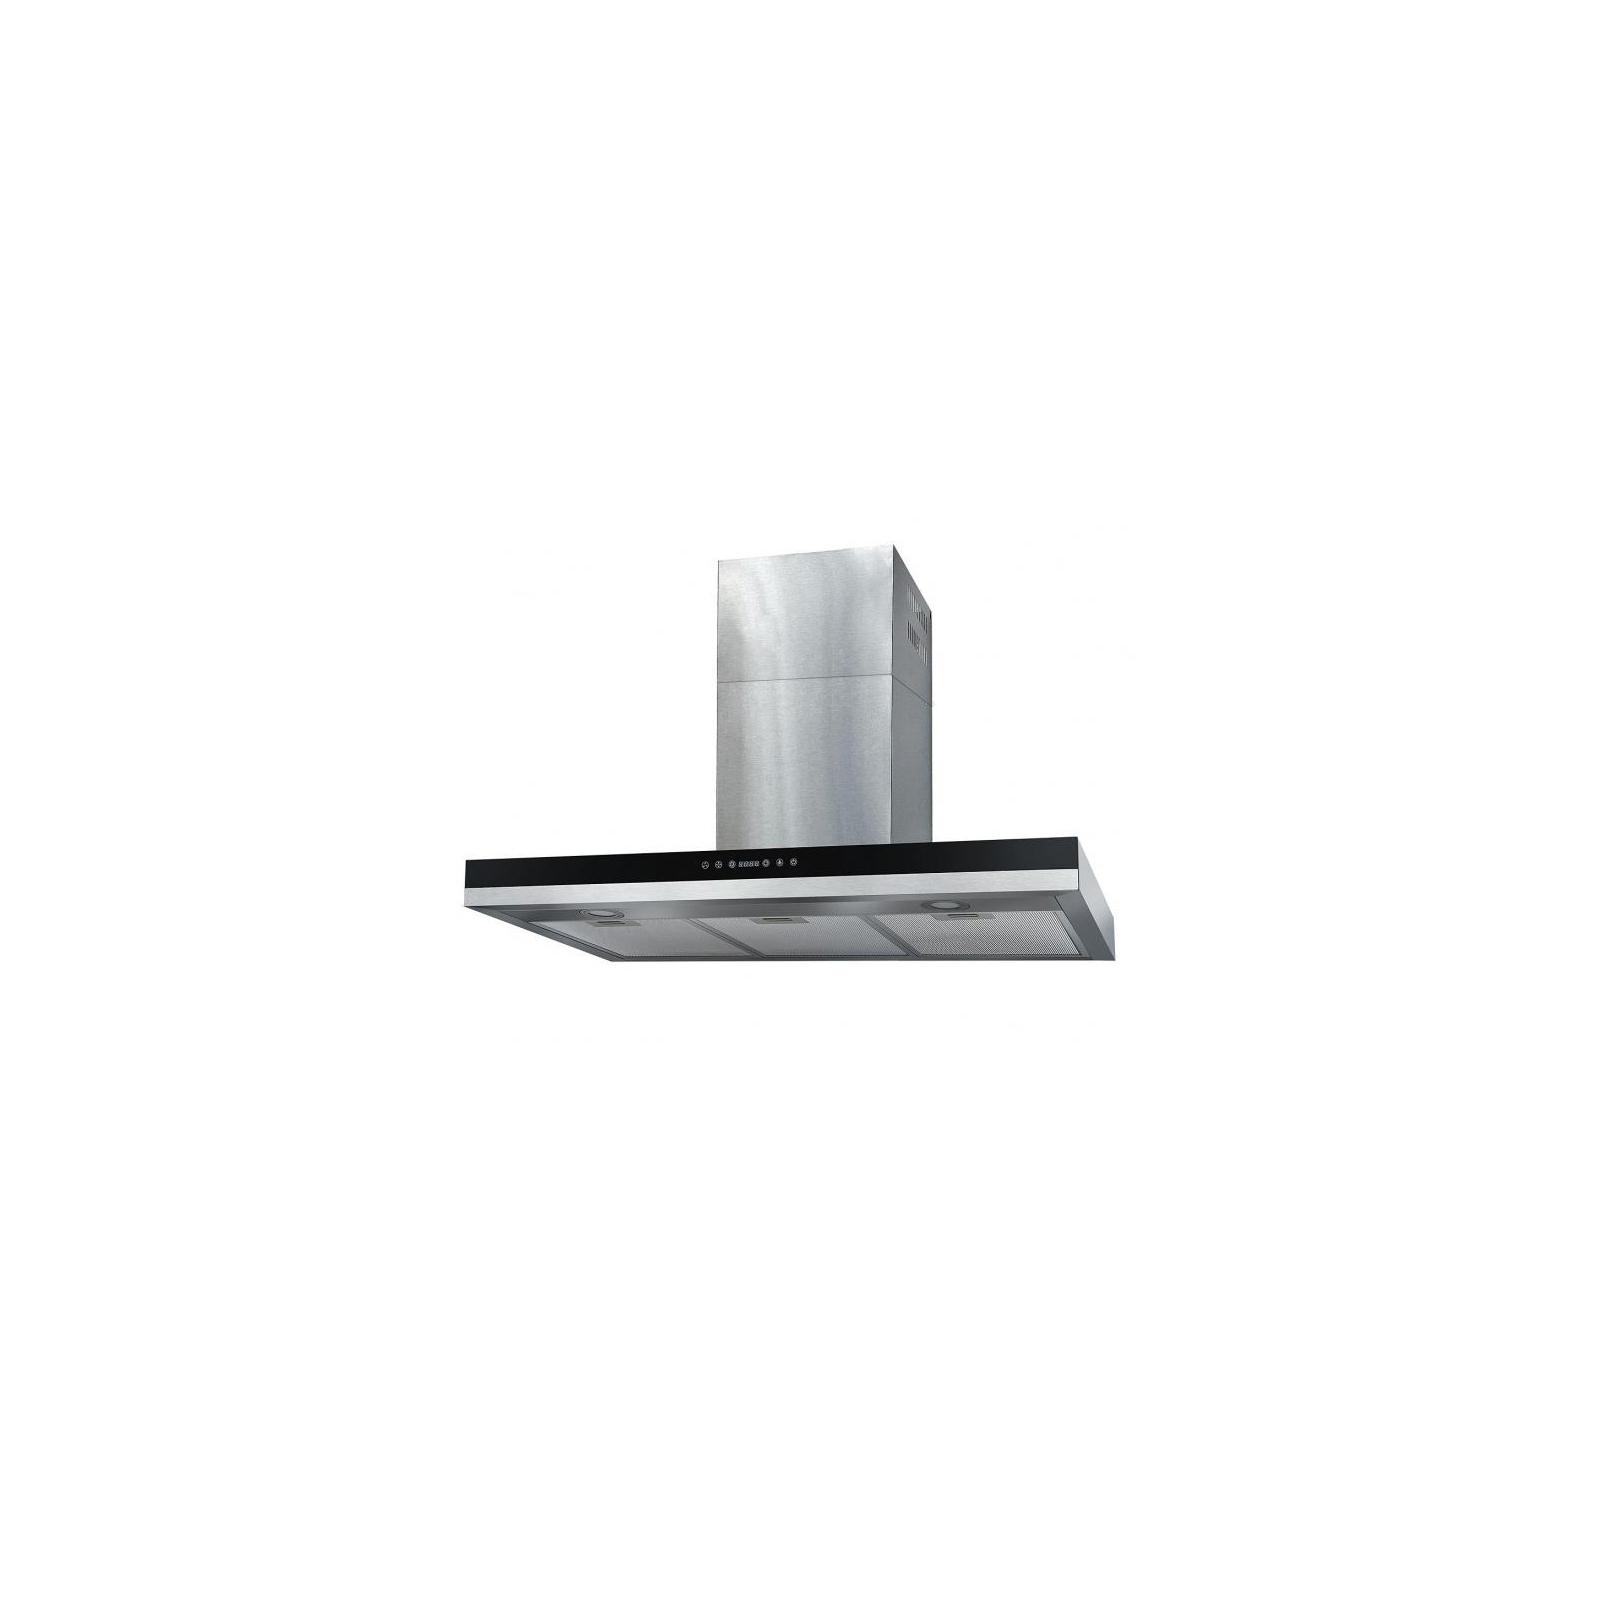 Вытяжка кухонная Ventolux ITALIA 90 BK/X (1200)